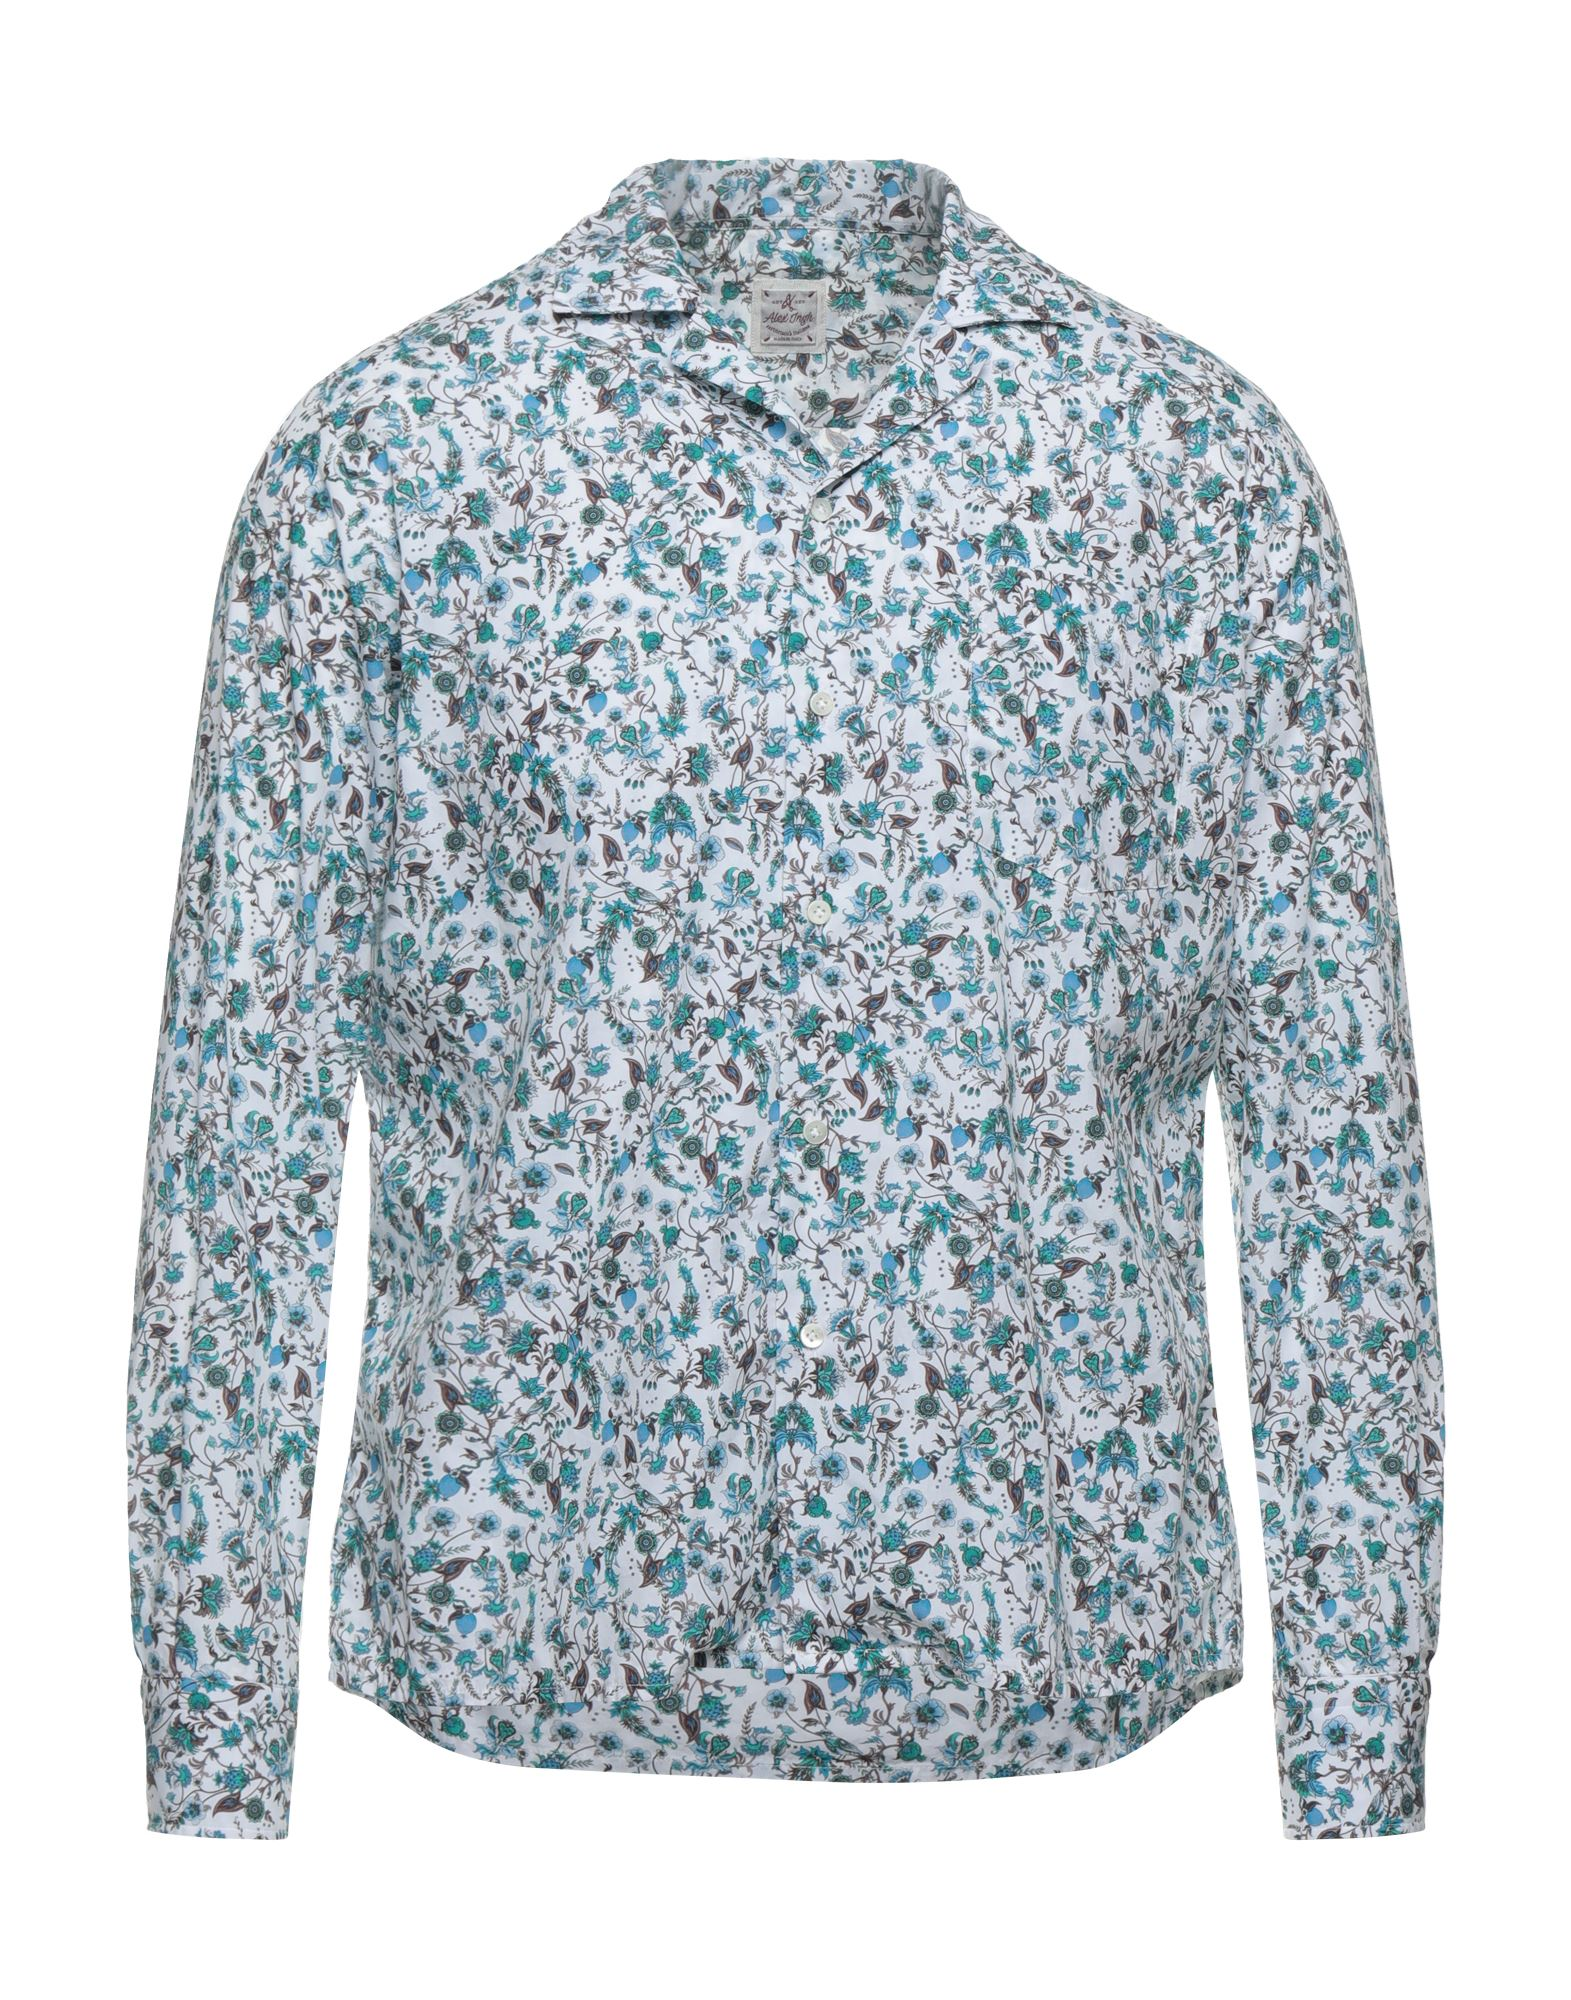 Alex Ingh Shirts In White